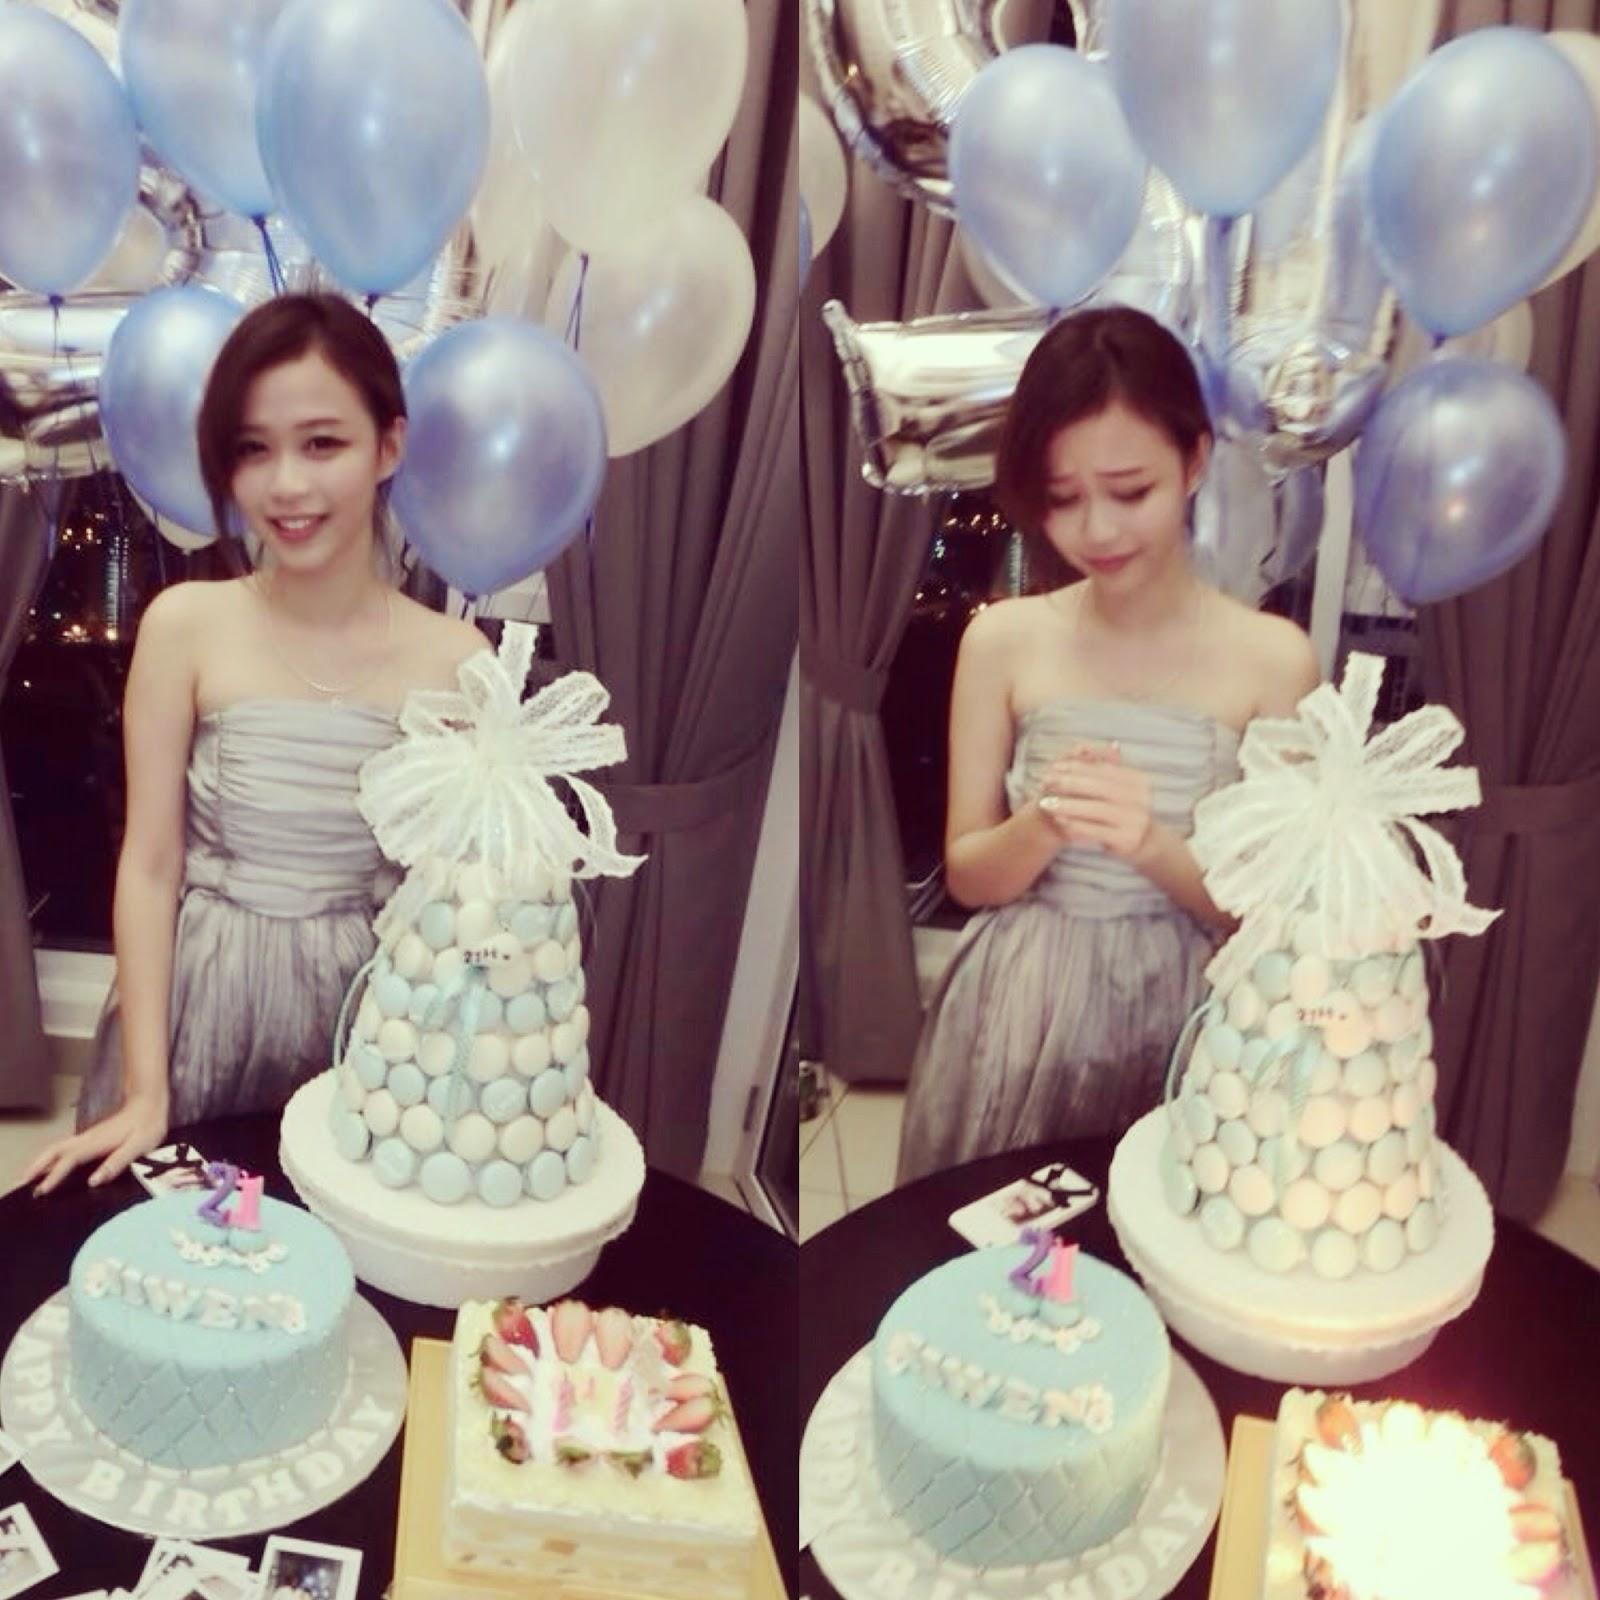 ♥ iiwen tan's blog: my 21st birthday celebration